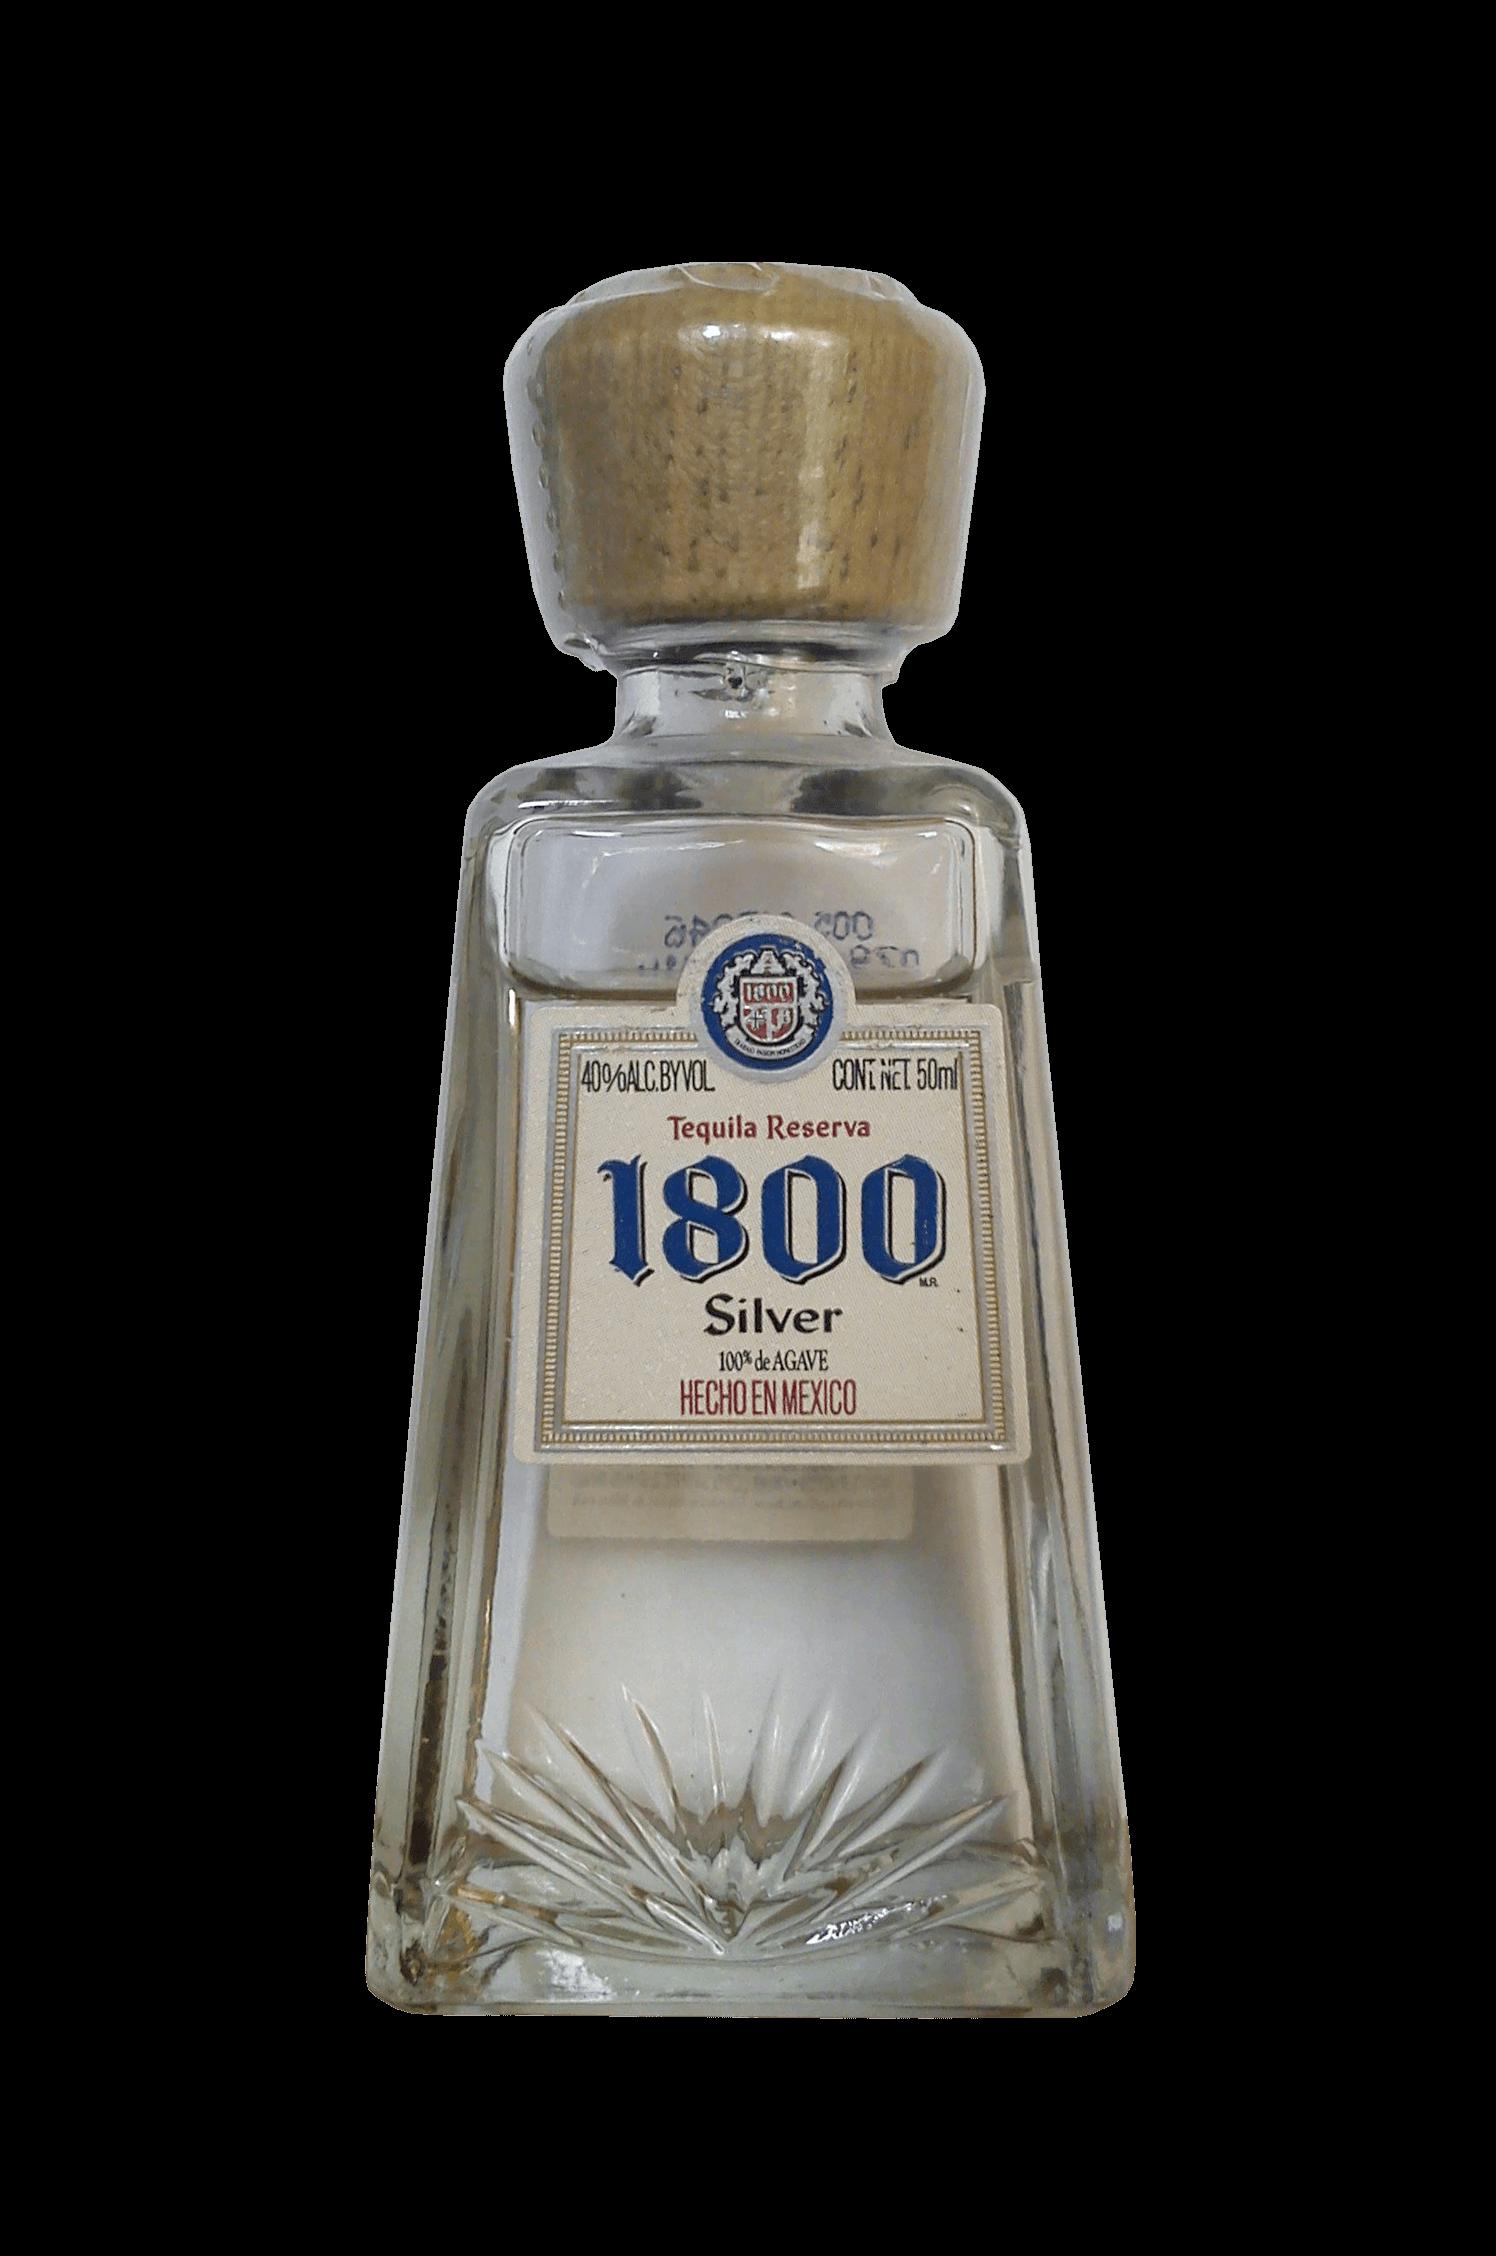 Tequila Reserva 1800 Silver